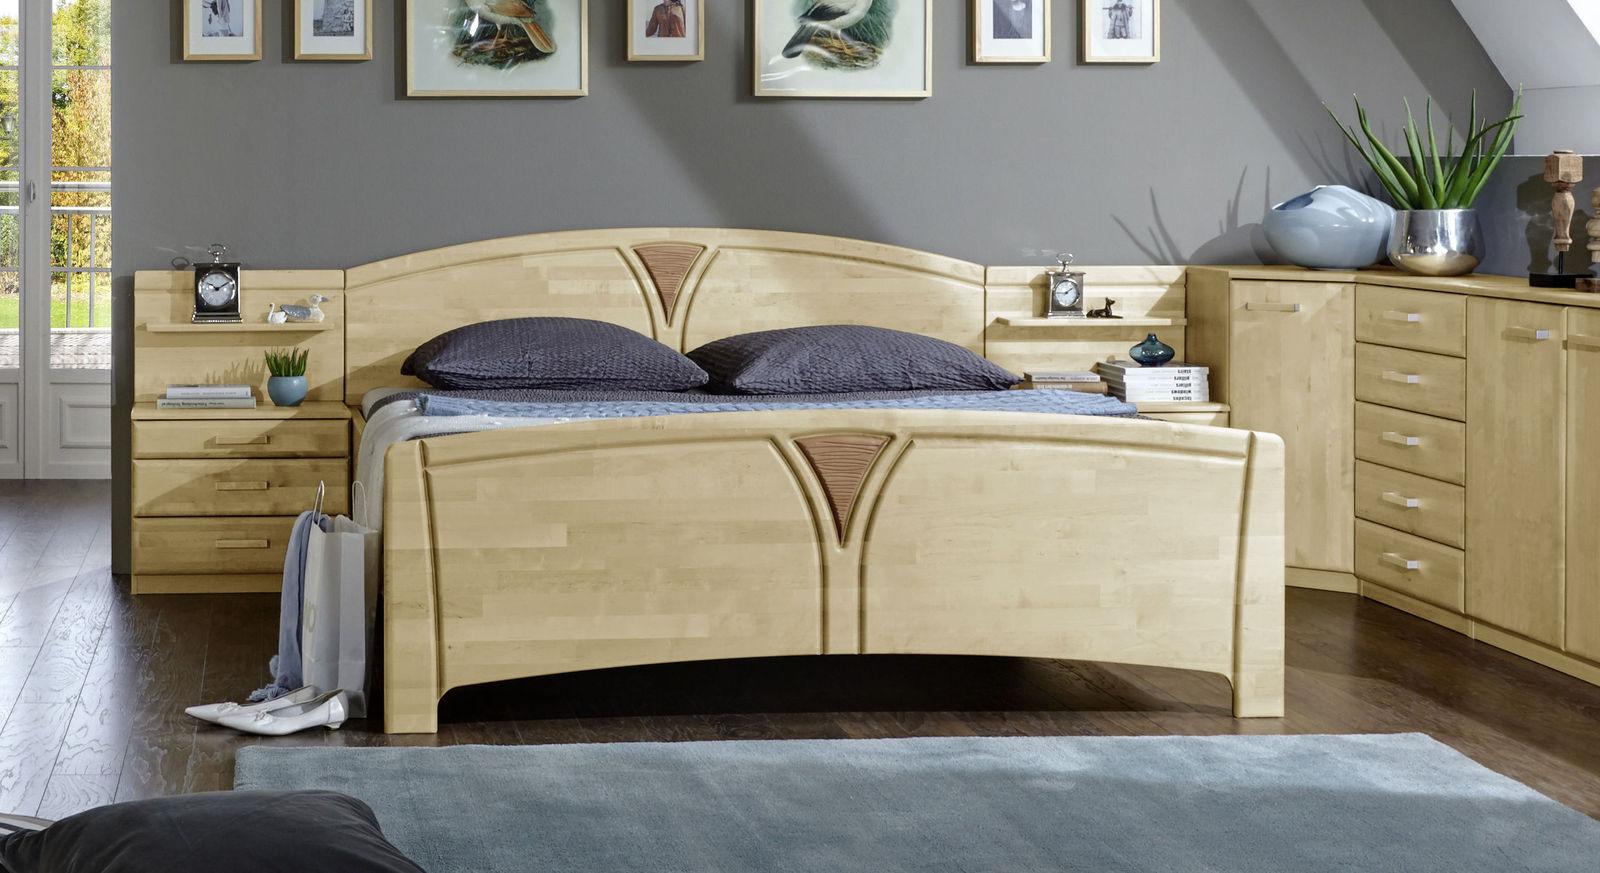 Stabiles Komfort-Doppelbett Karia mit Charme